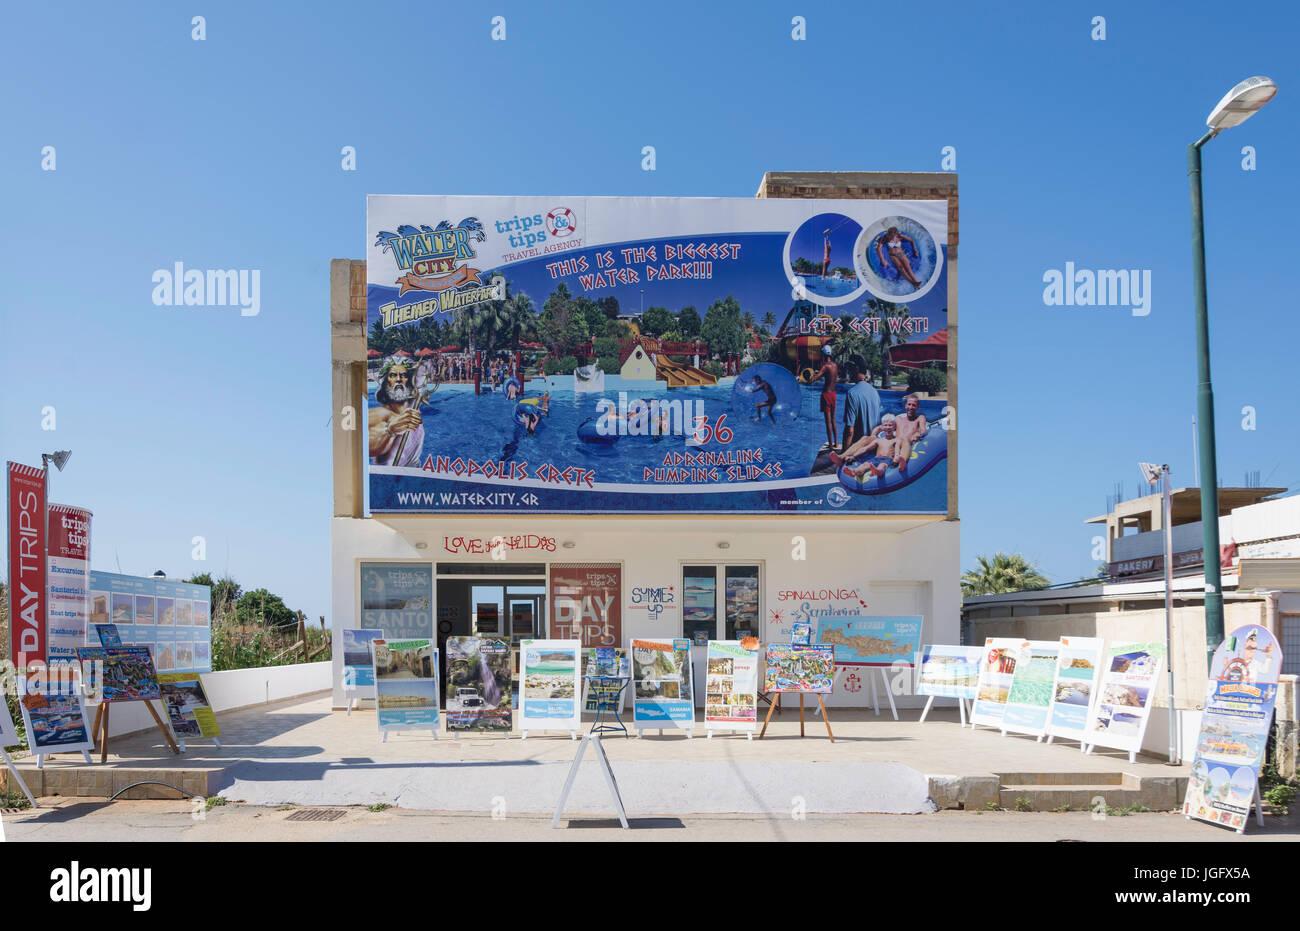 Reise Tipps, Reisebüro, Beach Road, Malia, Heraklion Region, Kreta (Kriti), Griechenland Stockbild